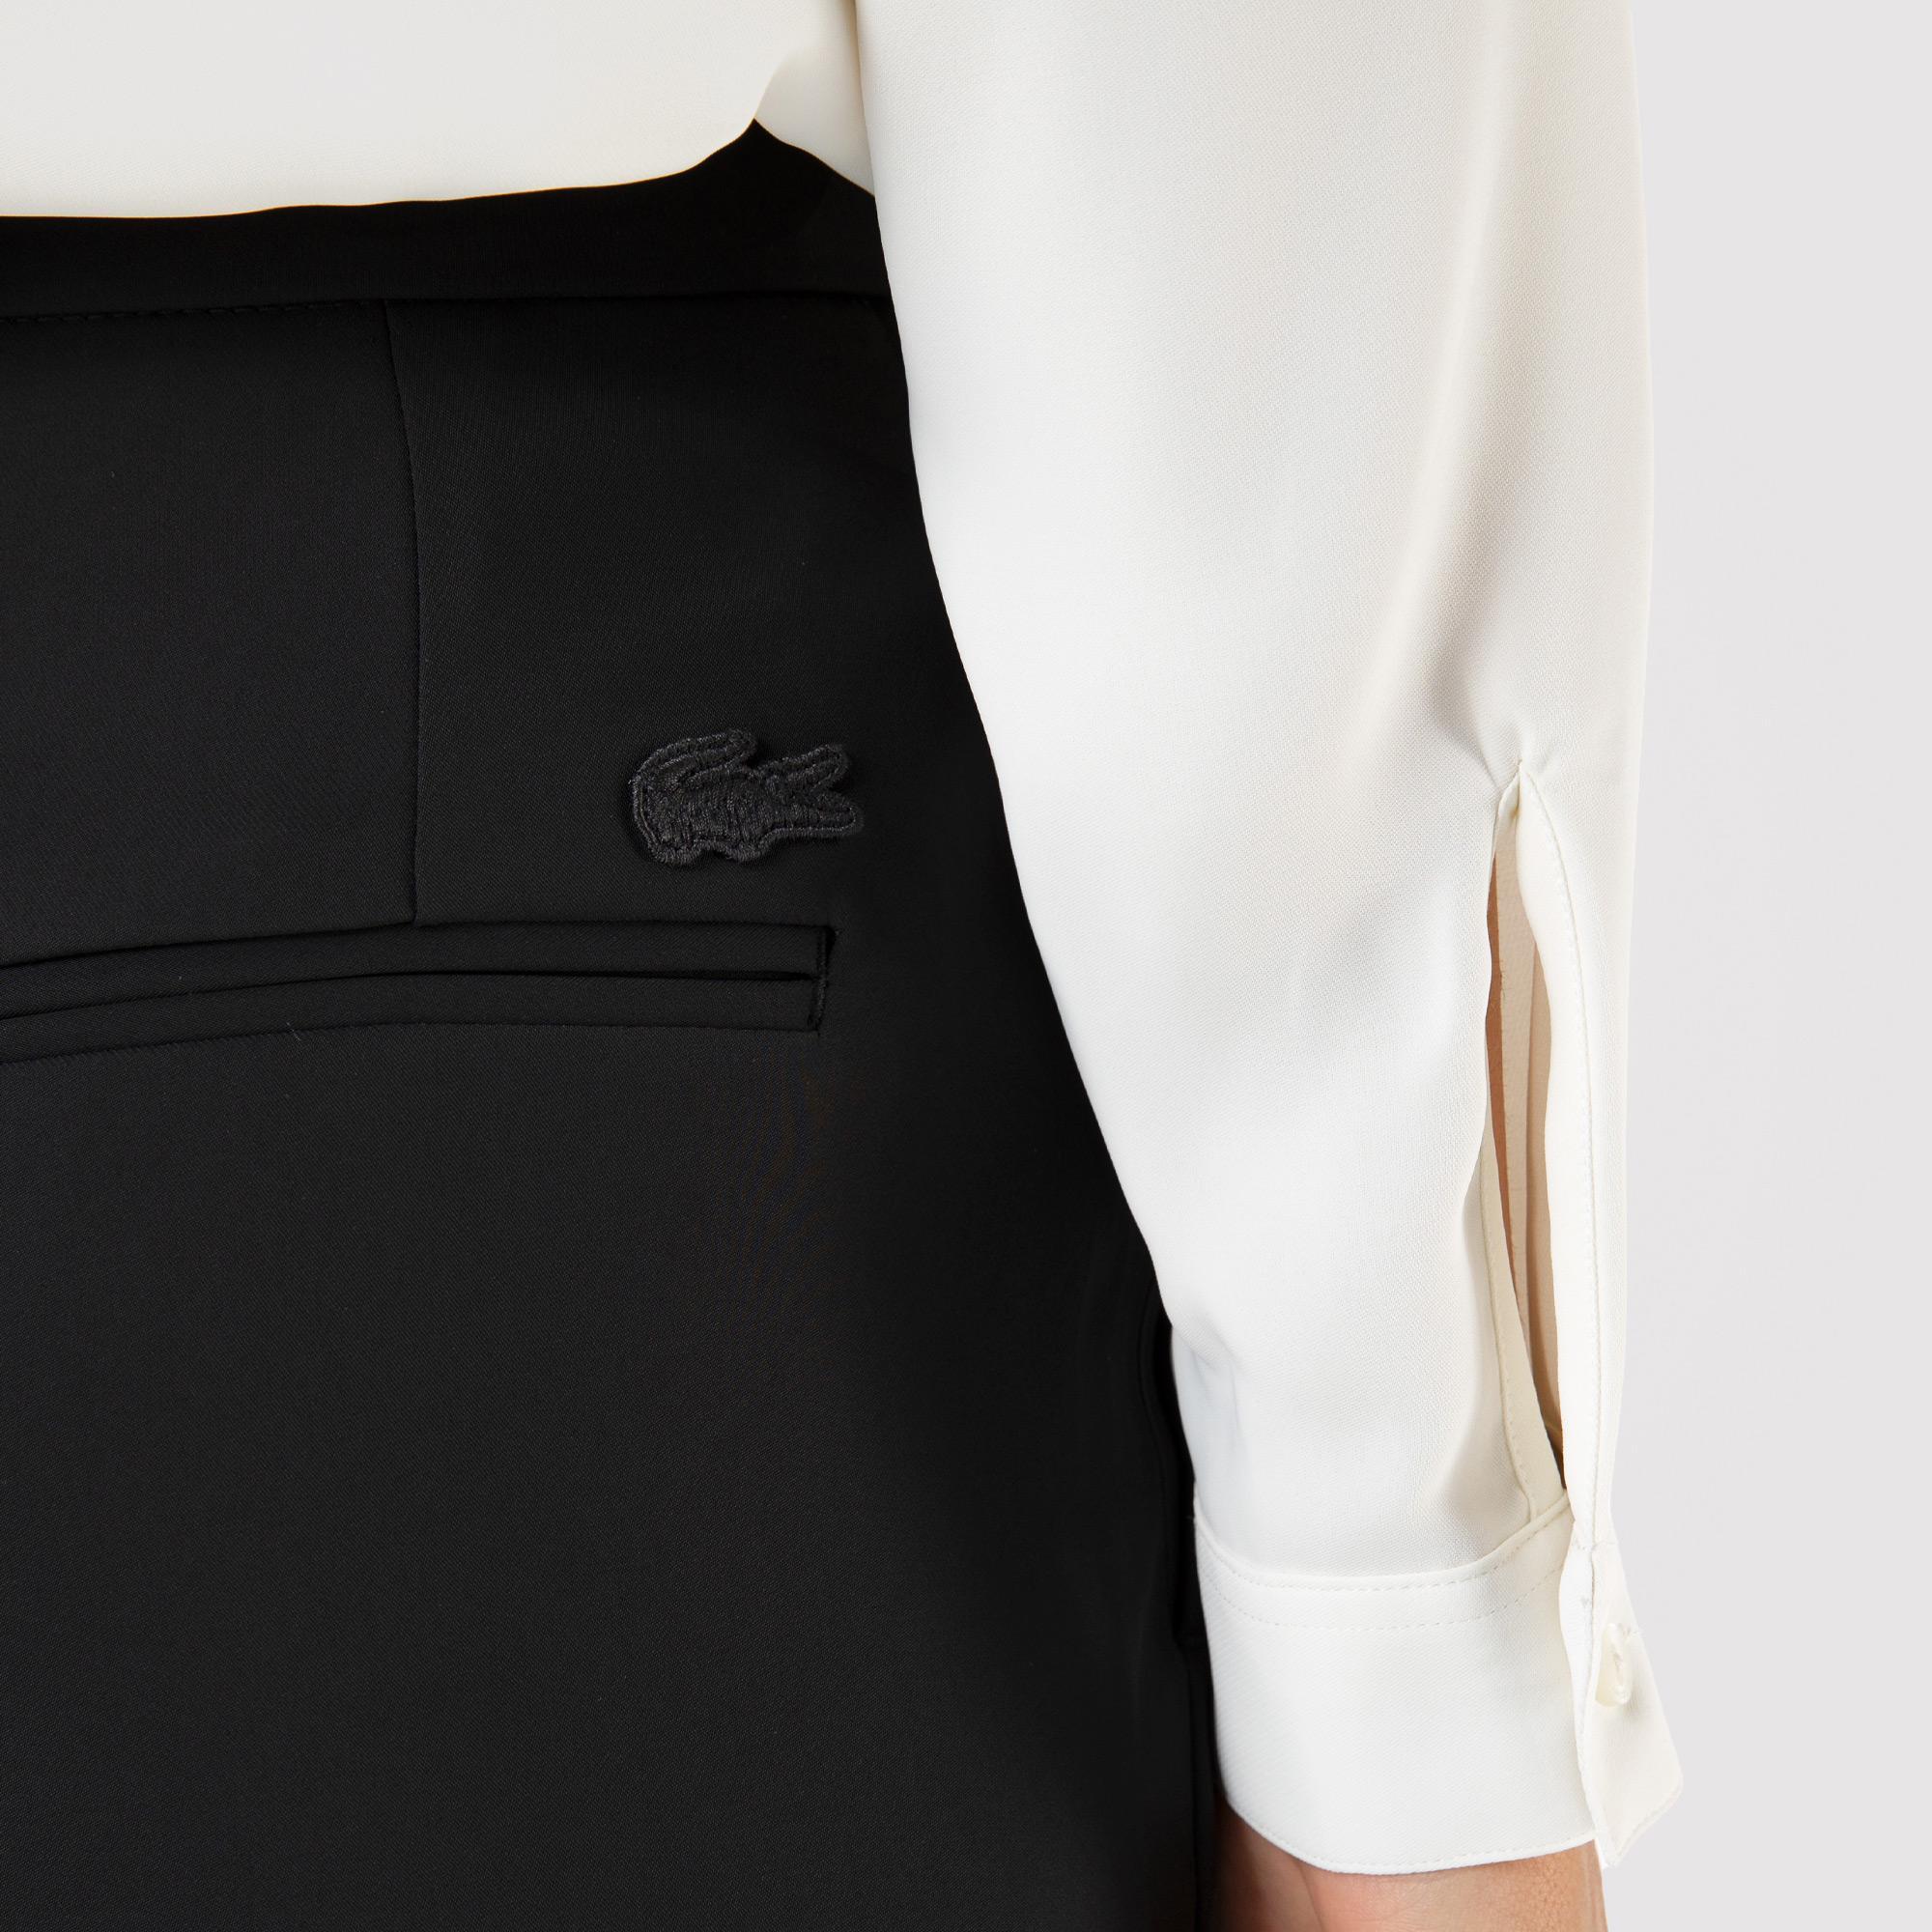 Lacoste Kadın Carrot Fit Siyah Pantolon